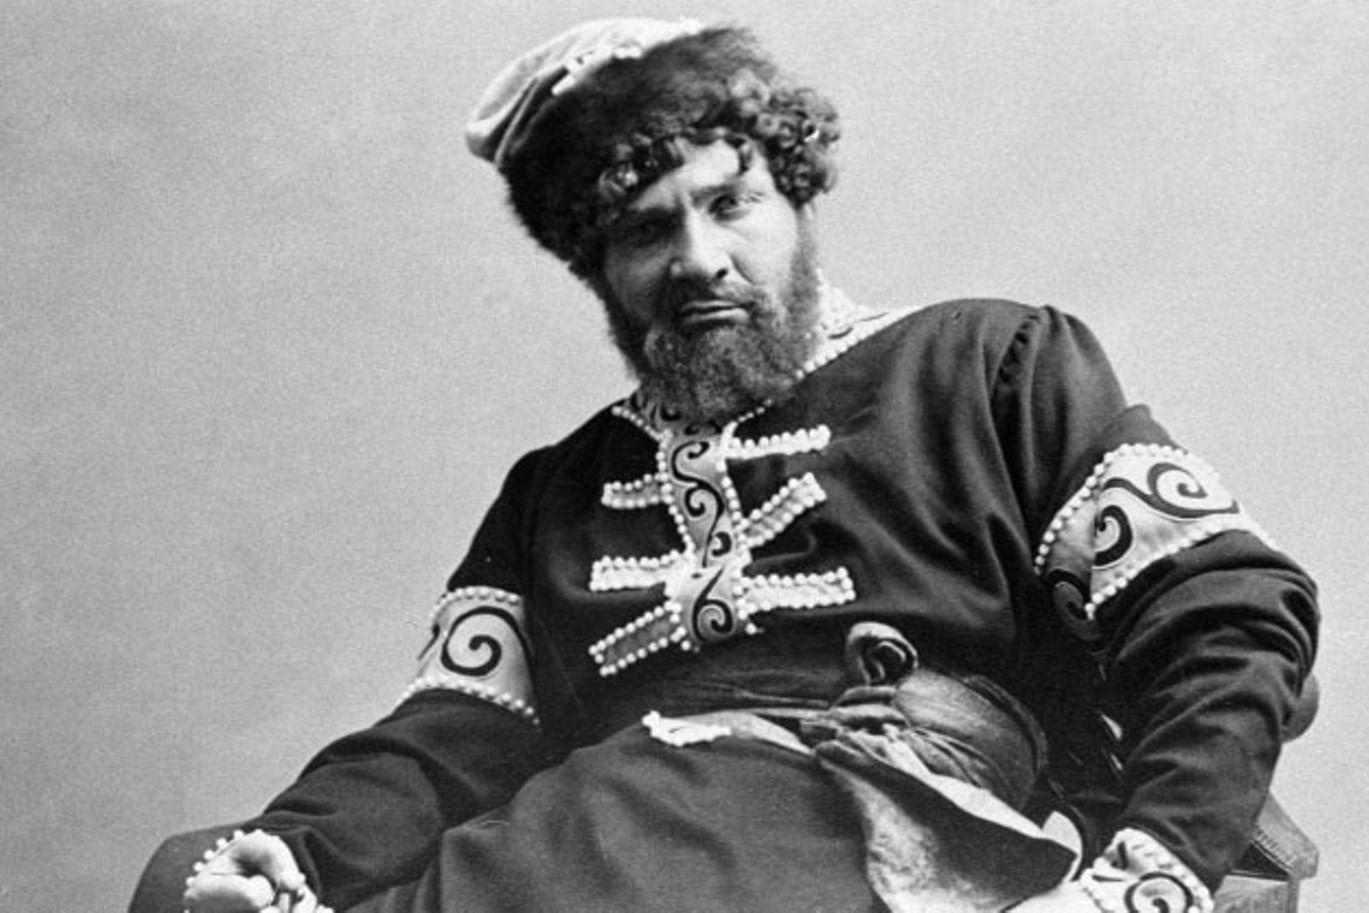 Фёдор Шаляпин: робкий великан, ставивший в тупик королей. Галерея 2